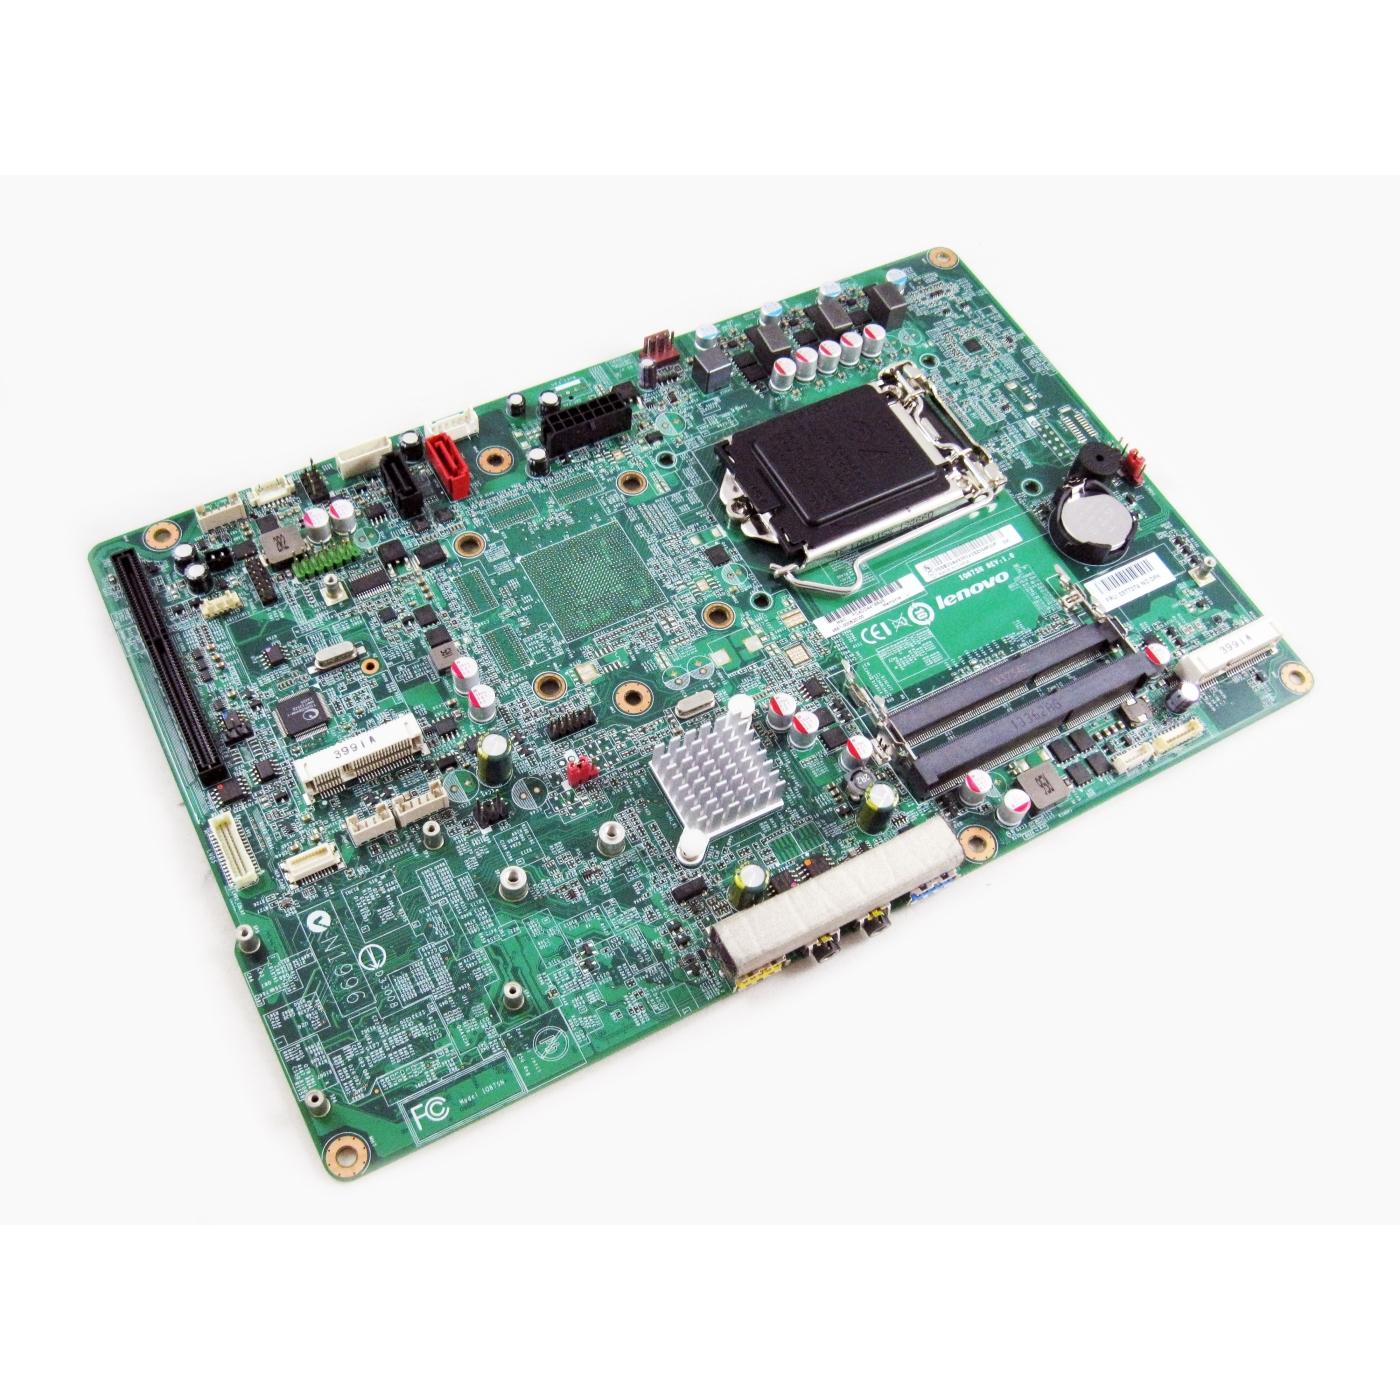 IBM 03T7274 Lenovo ThinkCentre M93z IQ87SN Motherboard